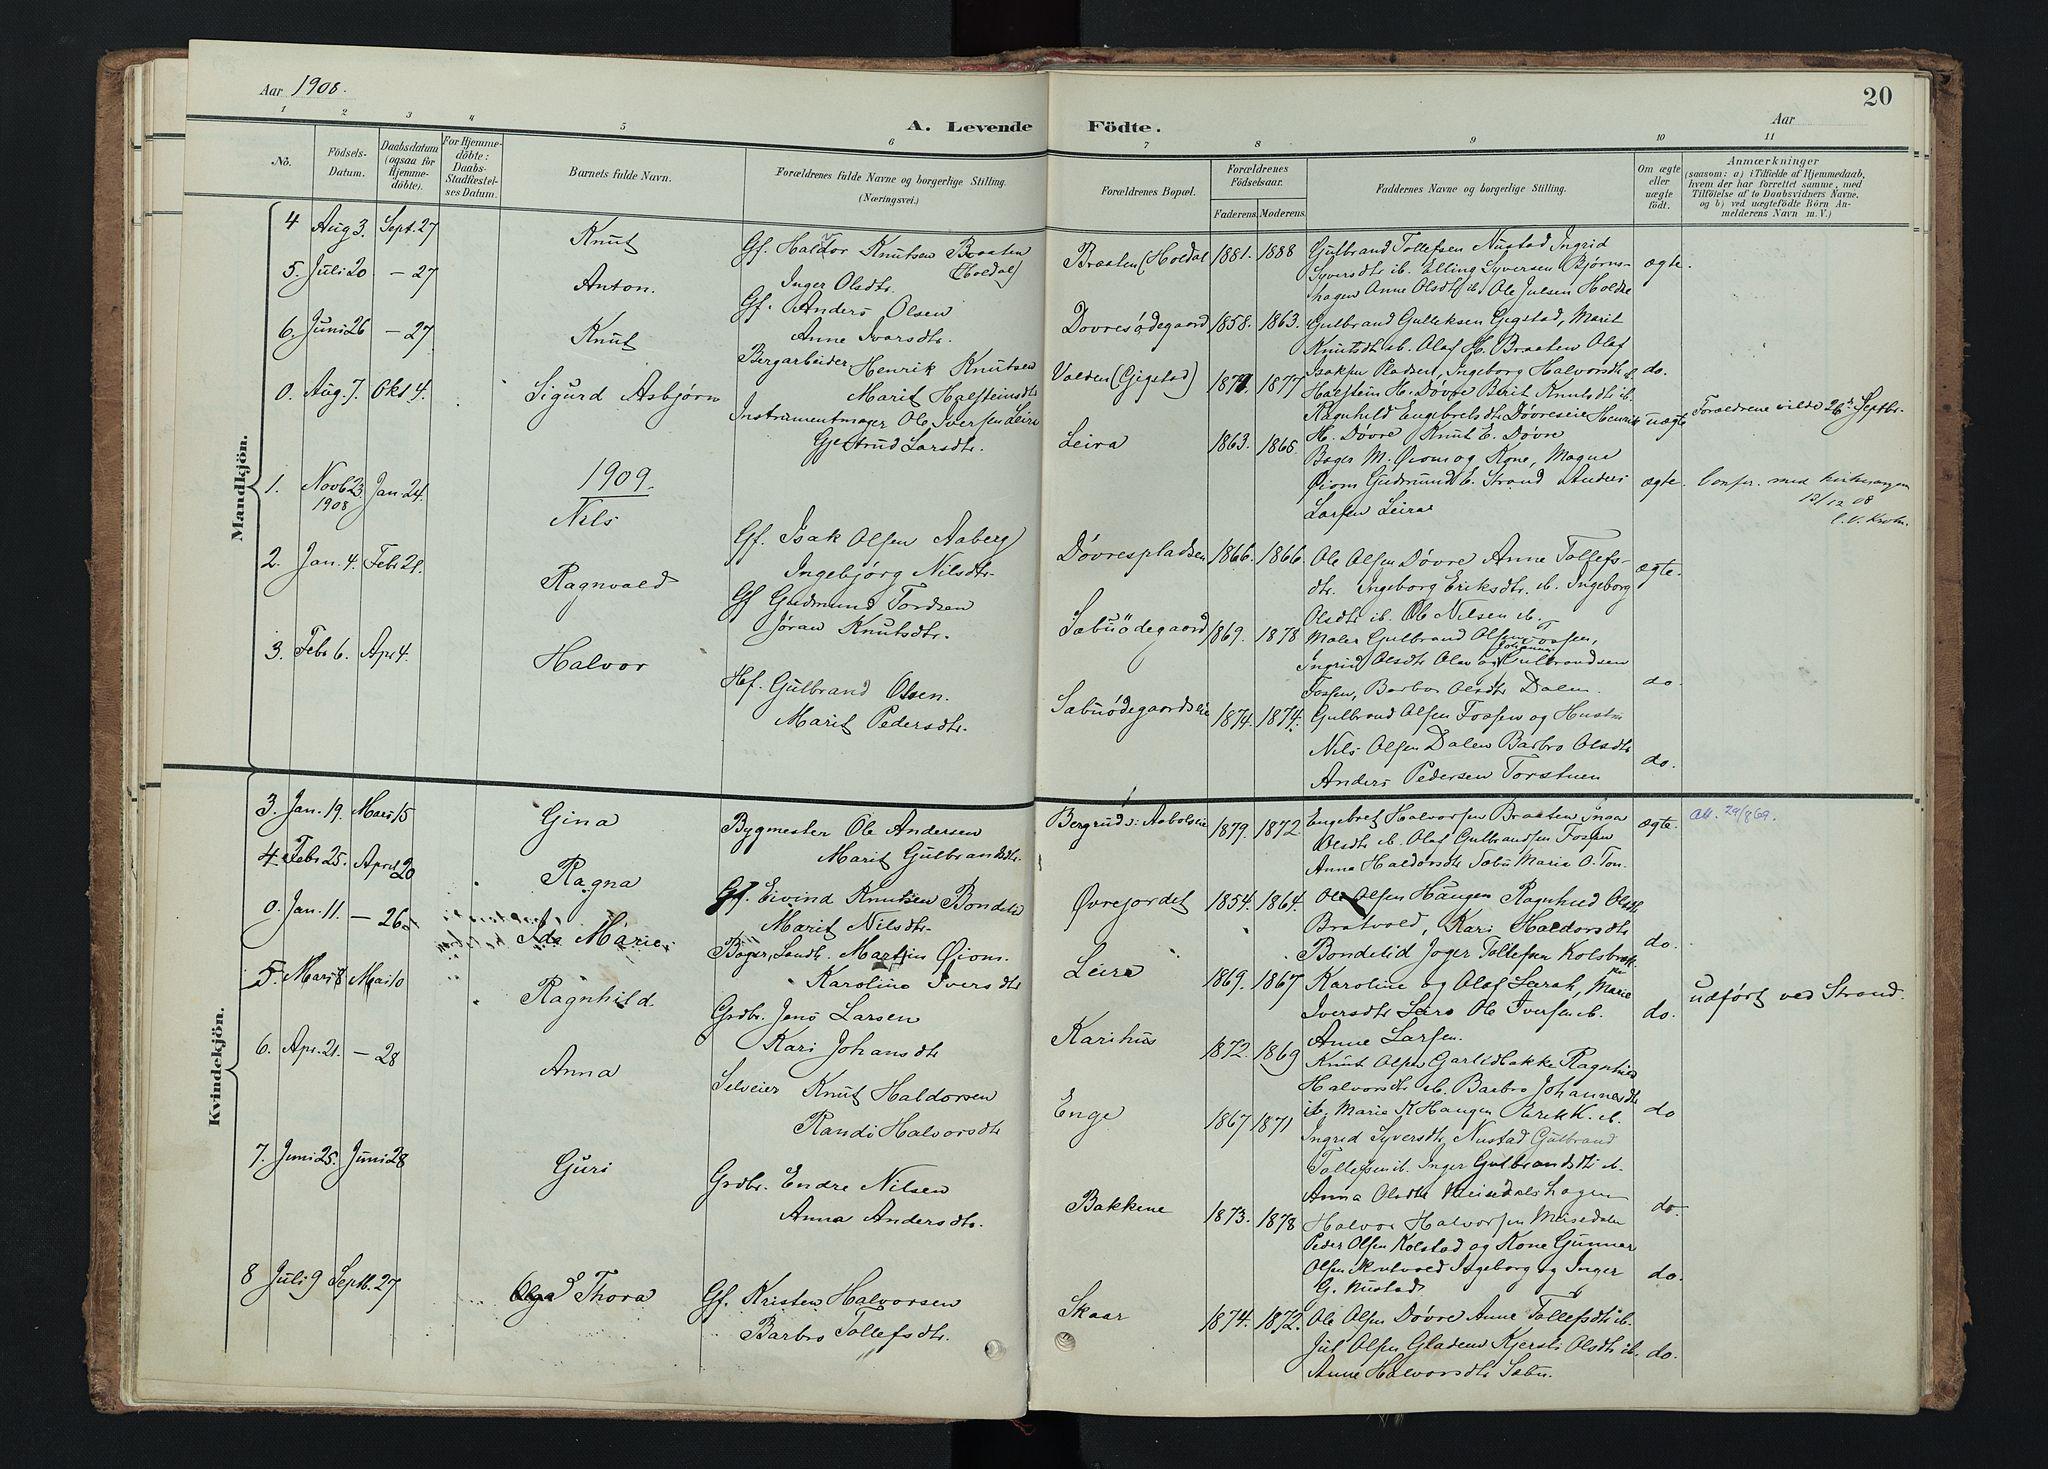 SAH, Nord-Aurdal prestekontor, Ministerialbok nr. 15, 1896-1914, s. 20